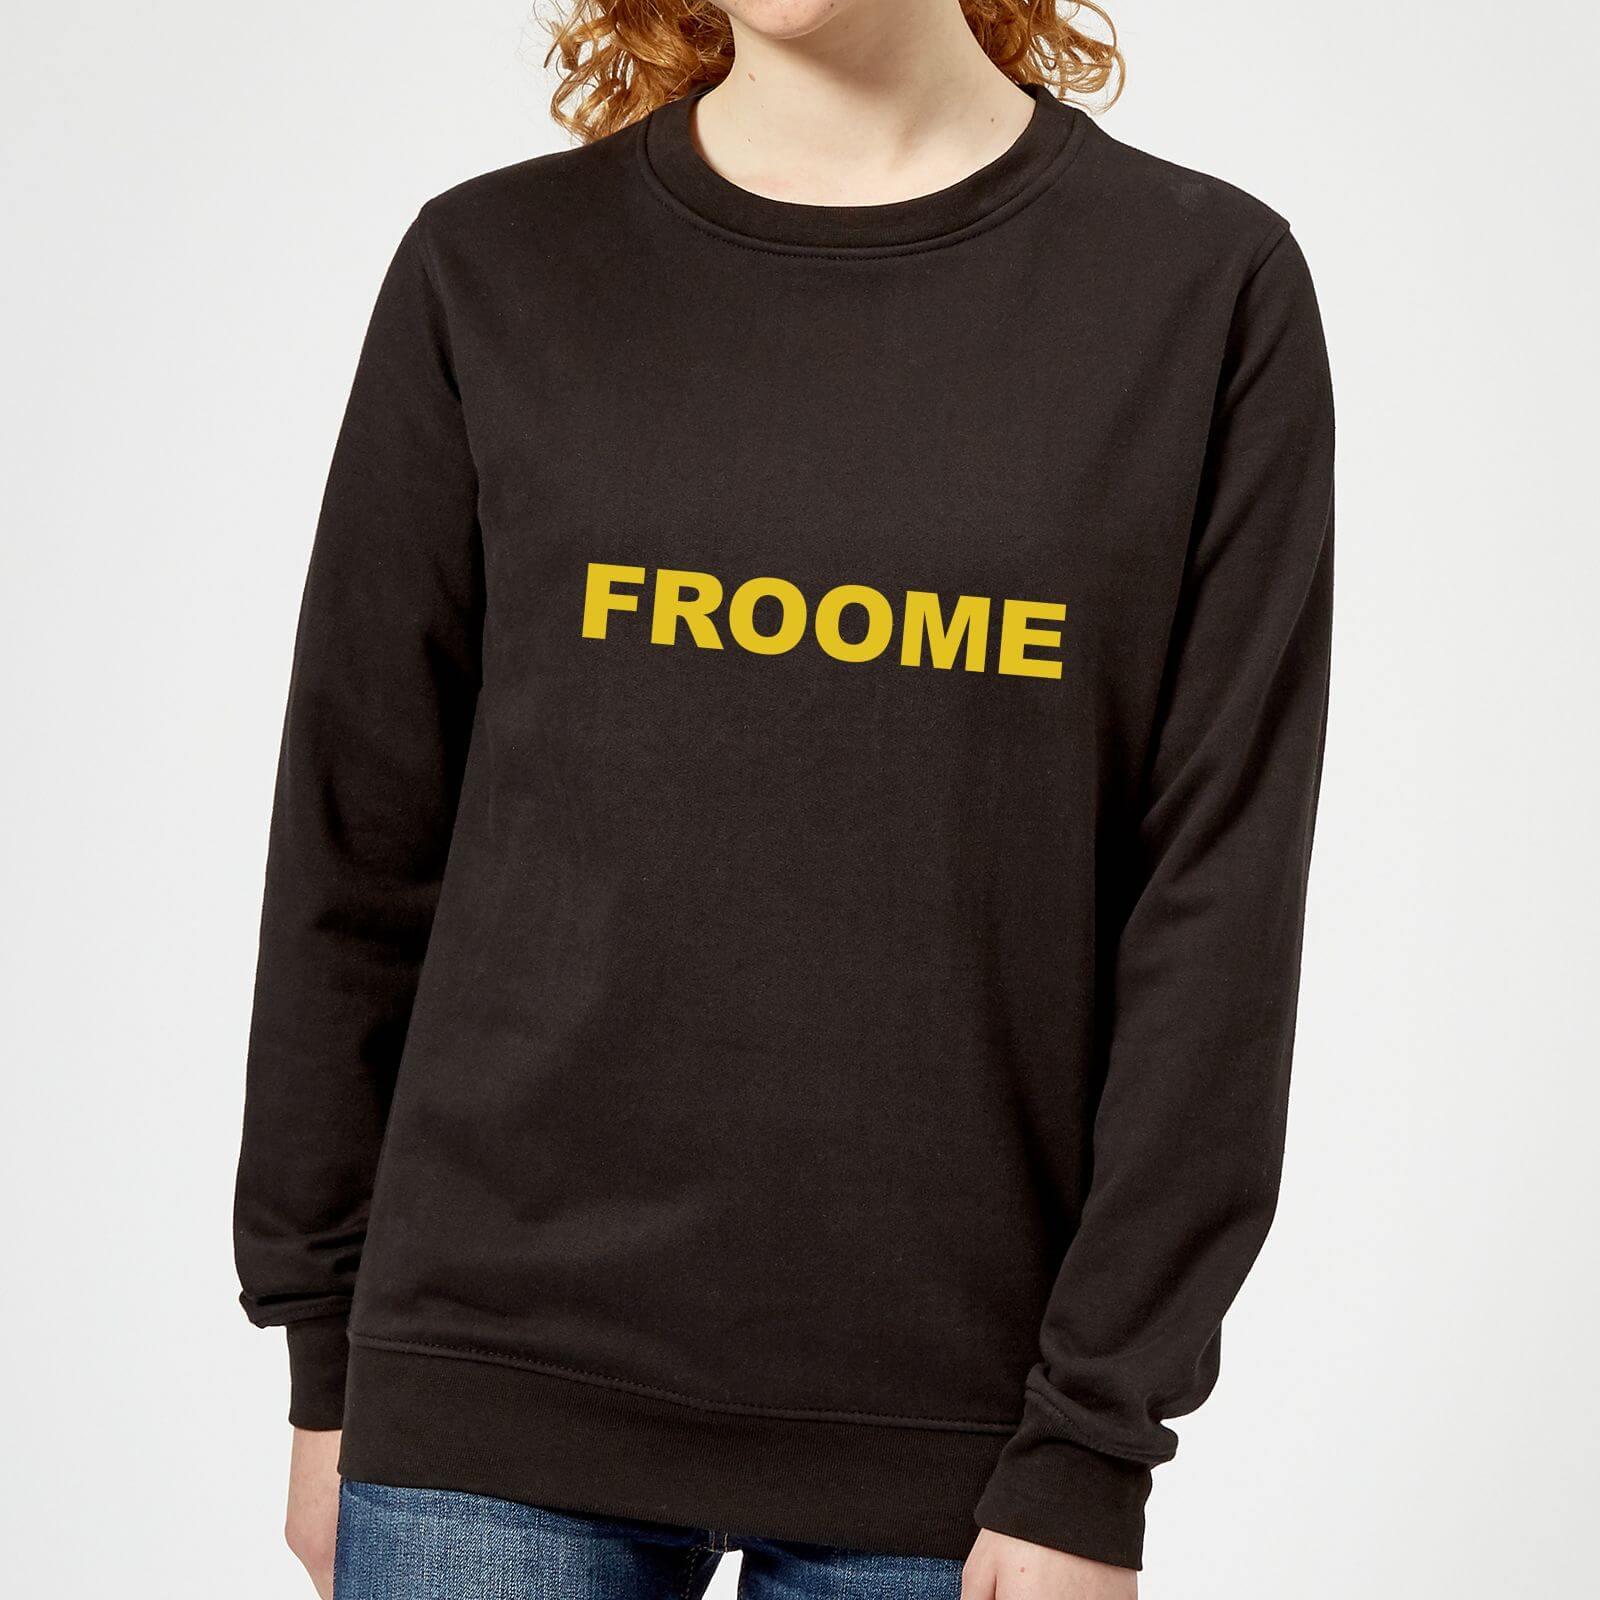 Summit Finish Froome - Rider Name Women's Sweatshirt - Black - XS - Black